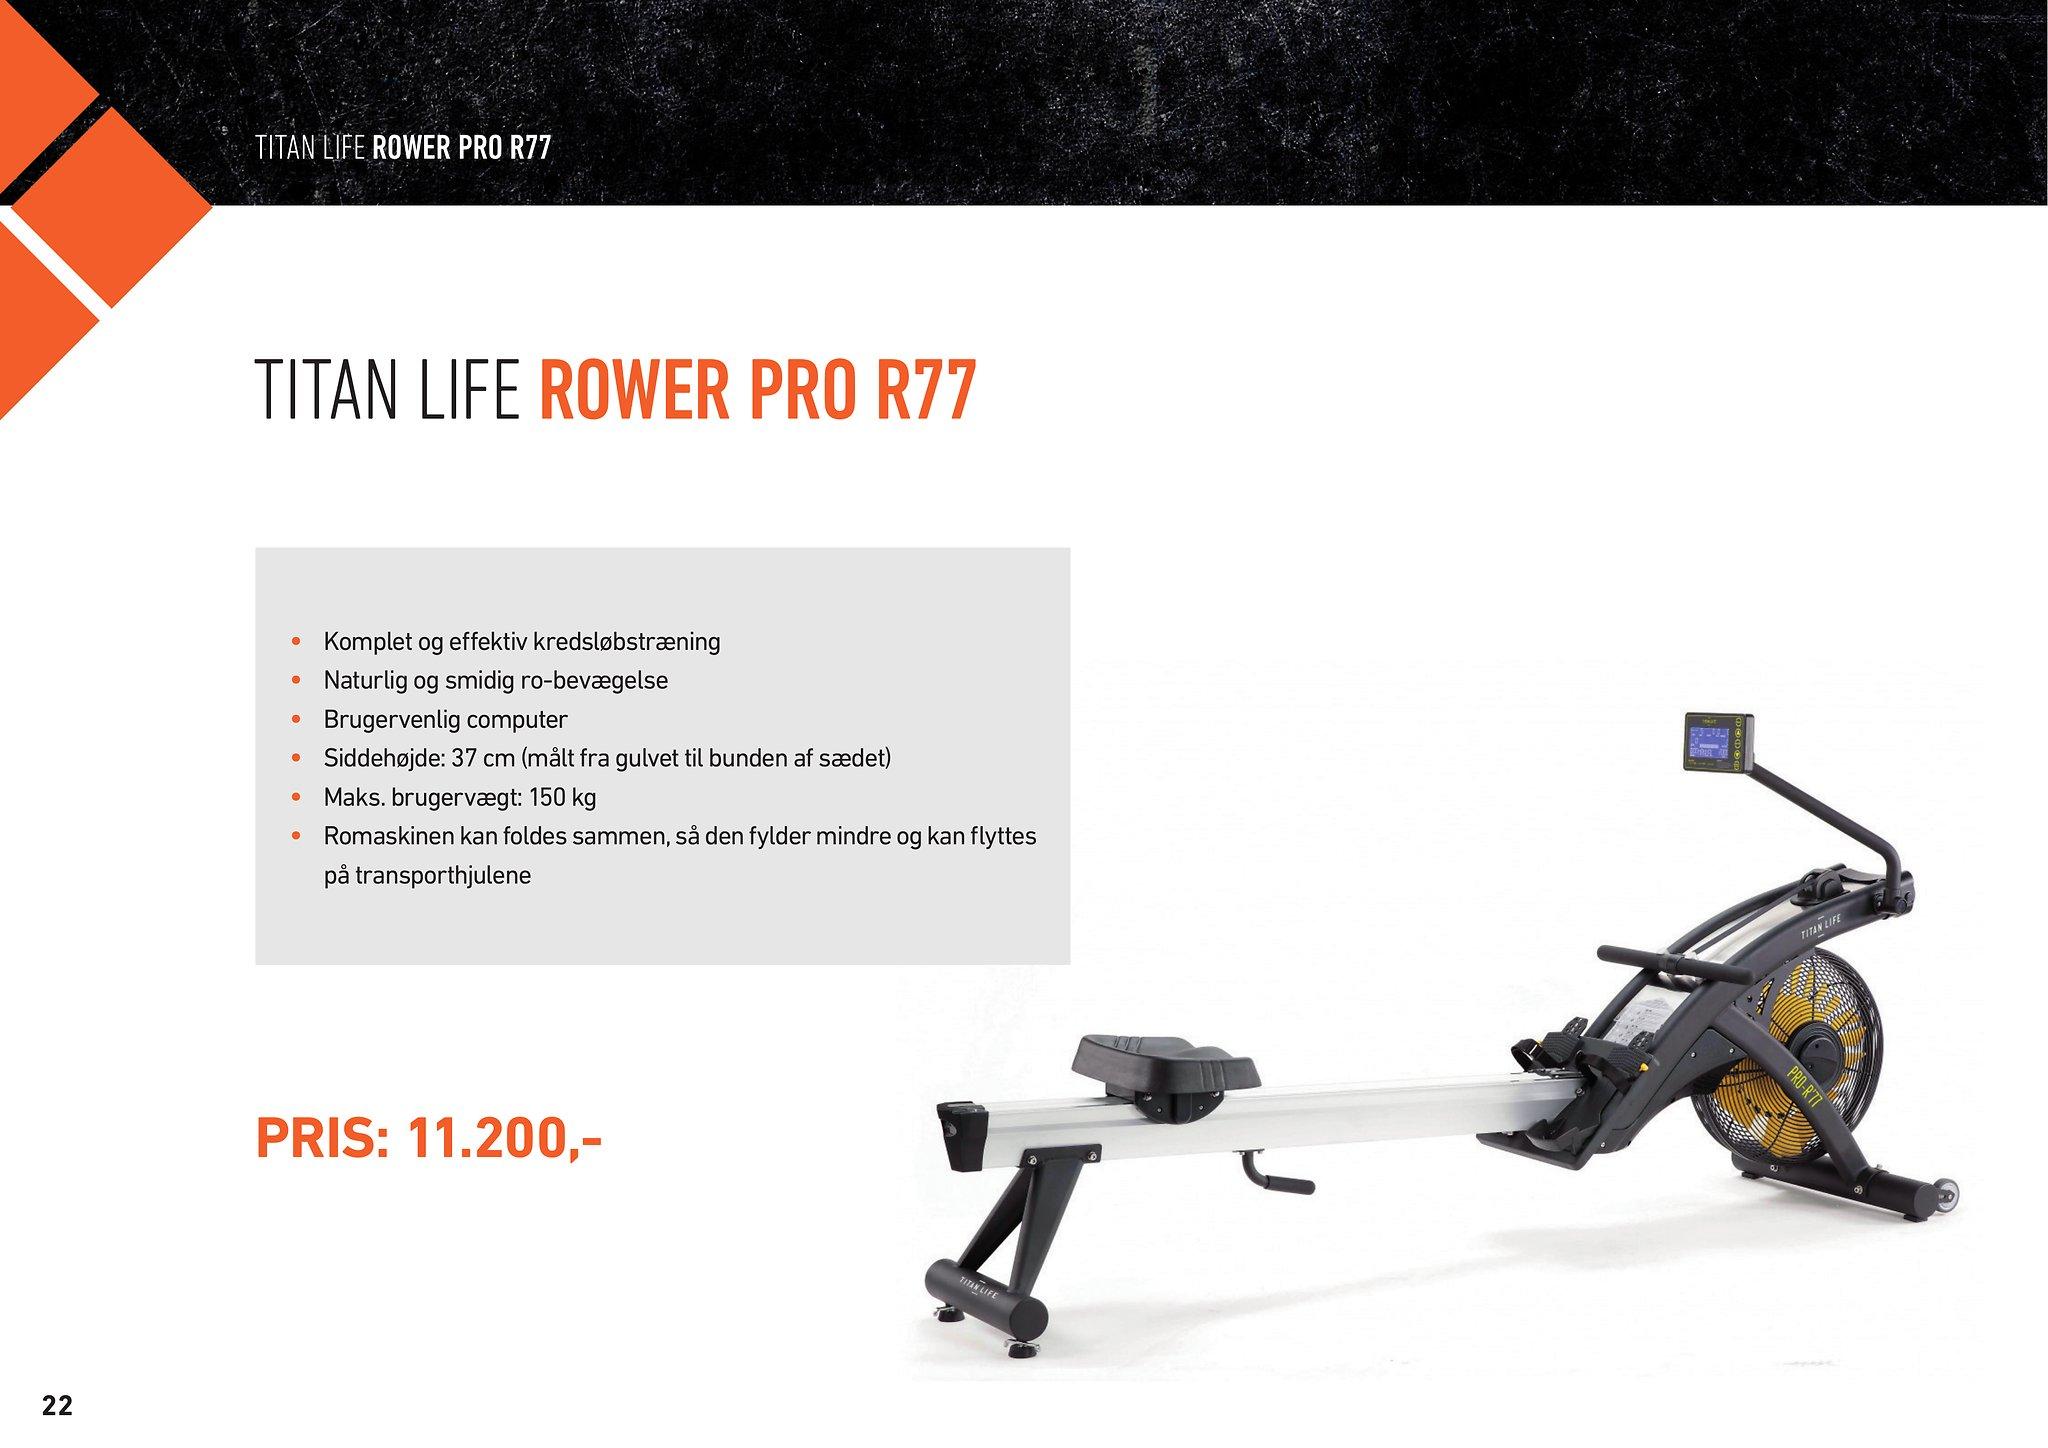 TITAN LIFE ROWER PRO R77 – HIIT – MedicSport